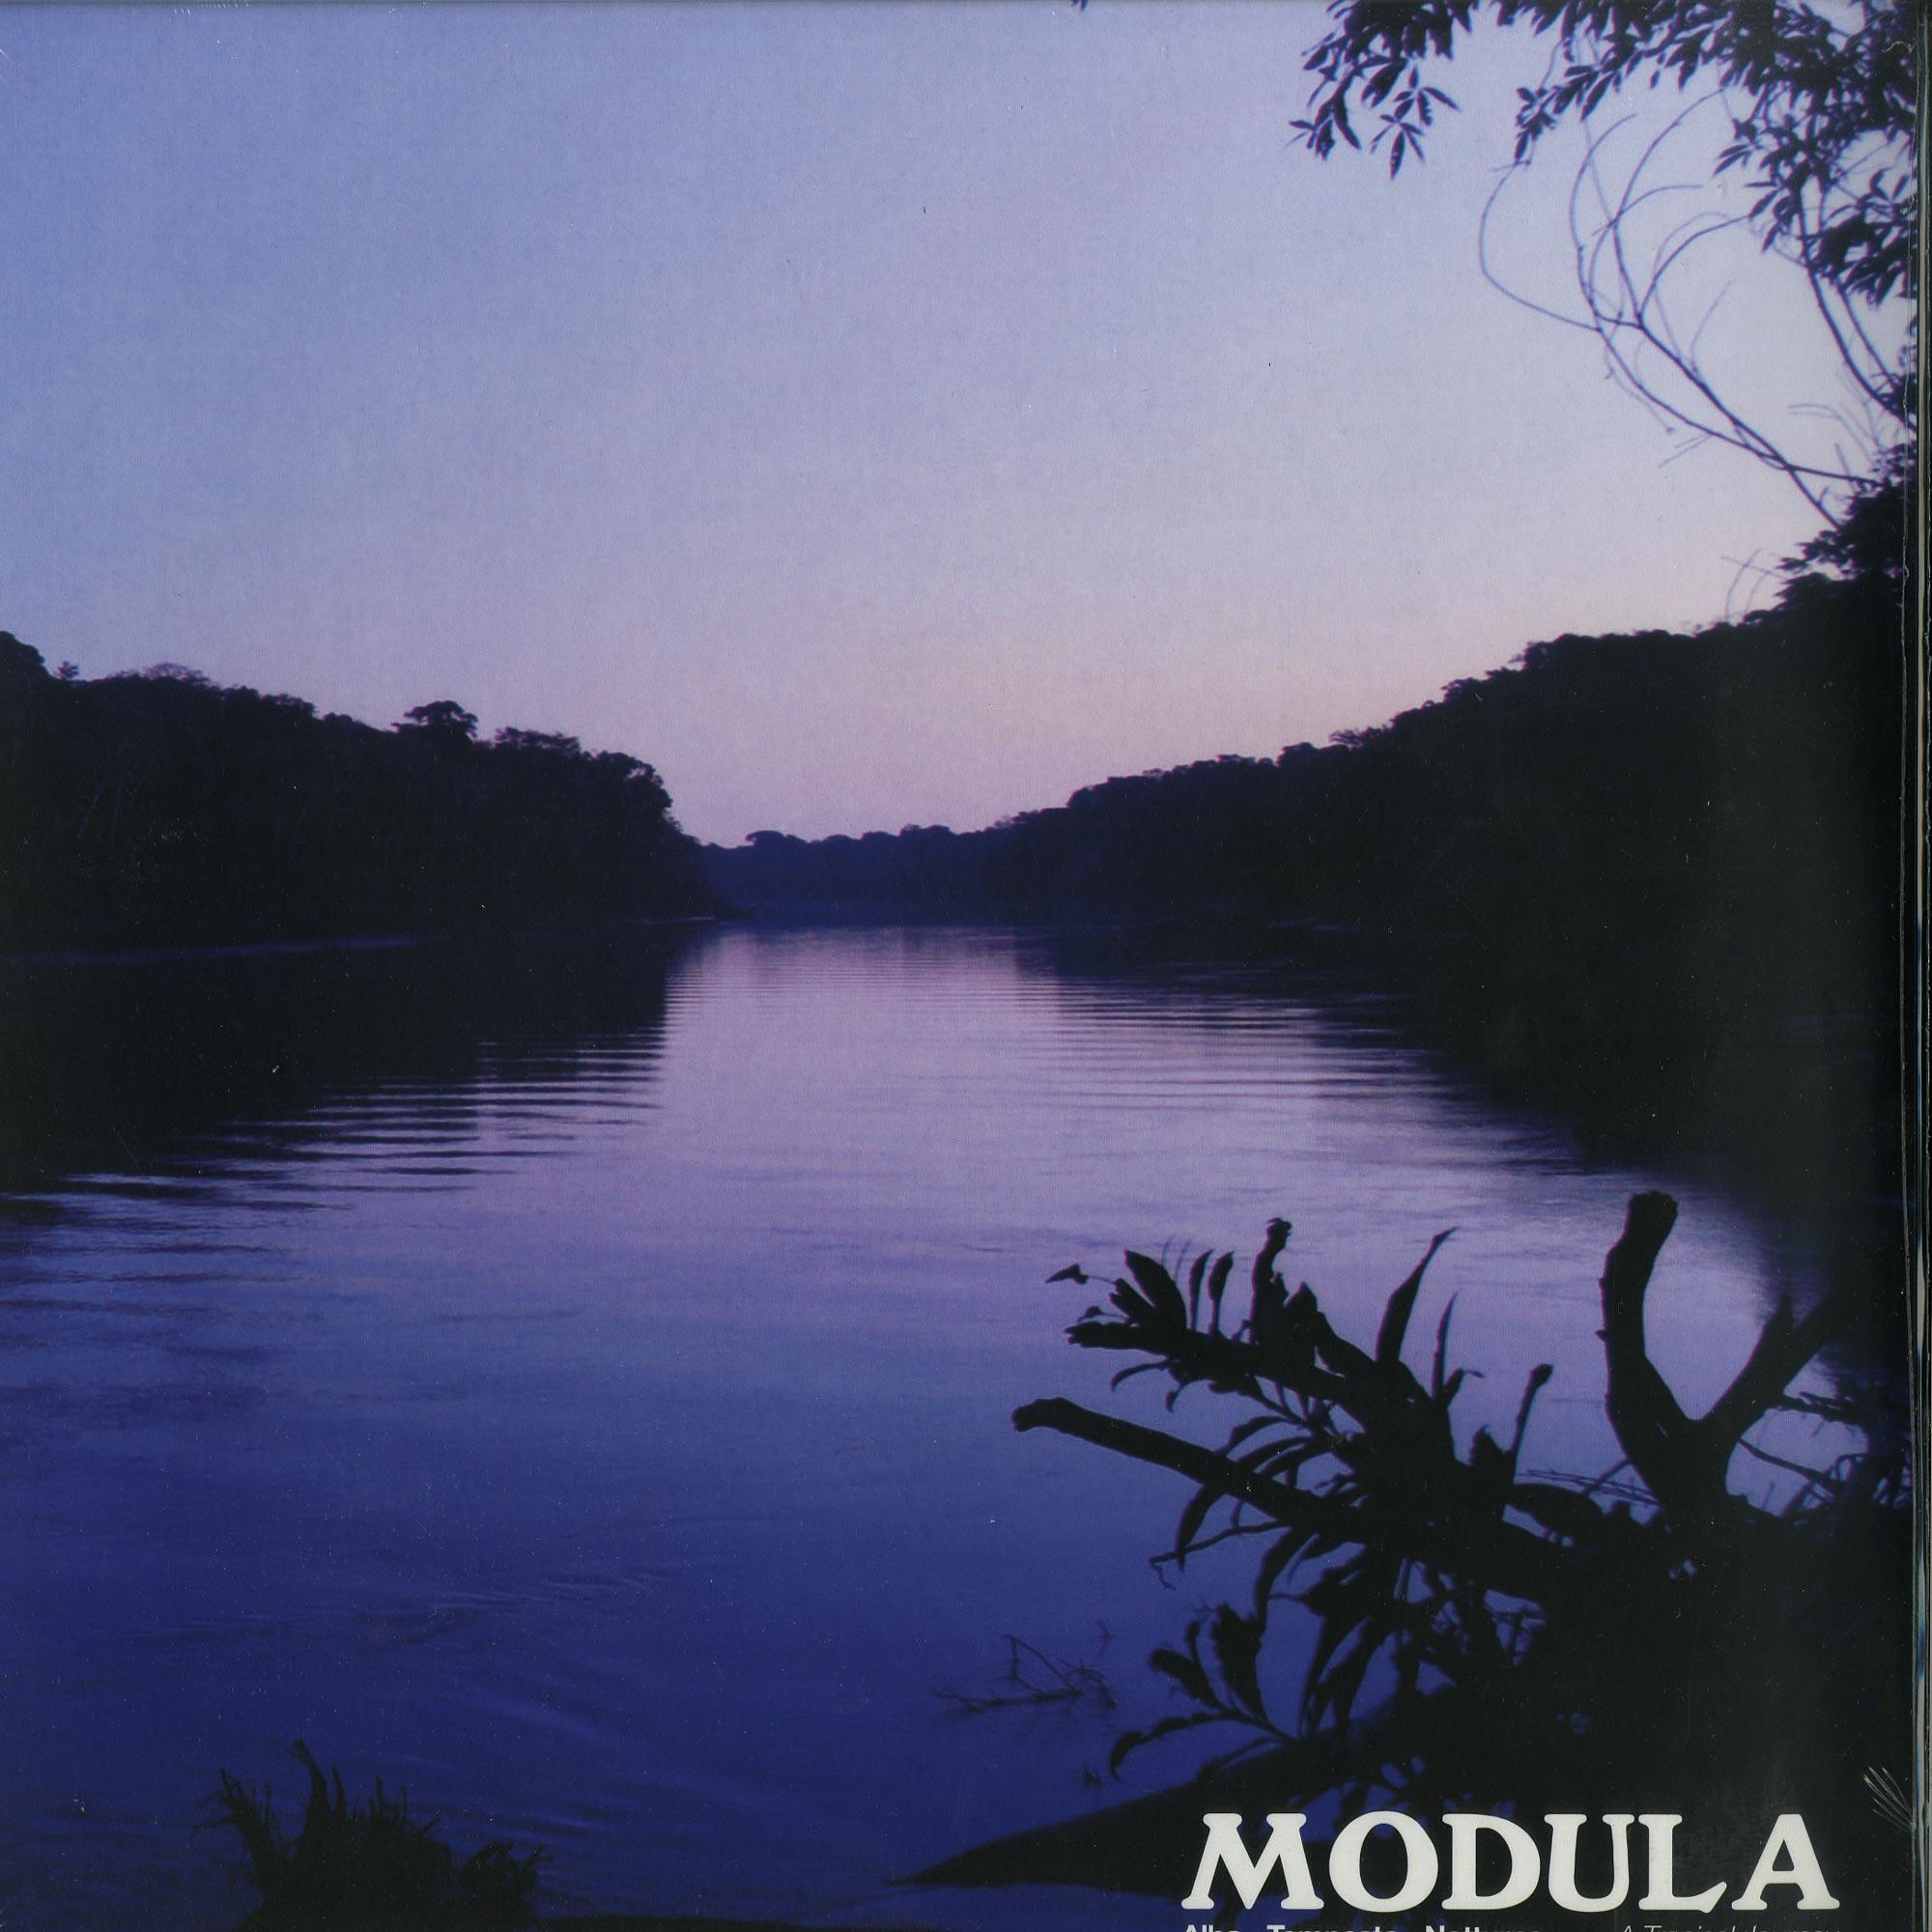 Modula - ALBA - TEMPESTA - NOTTURNO